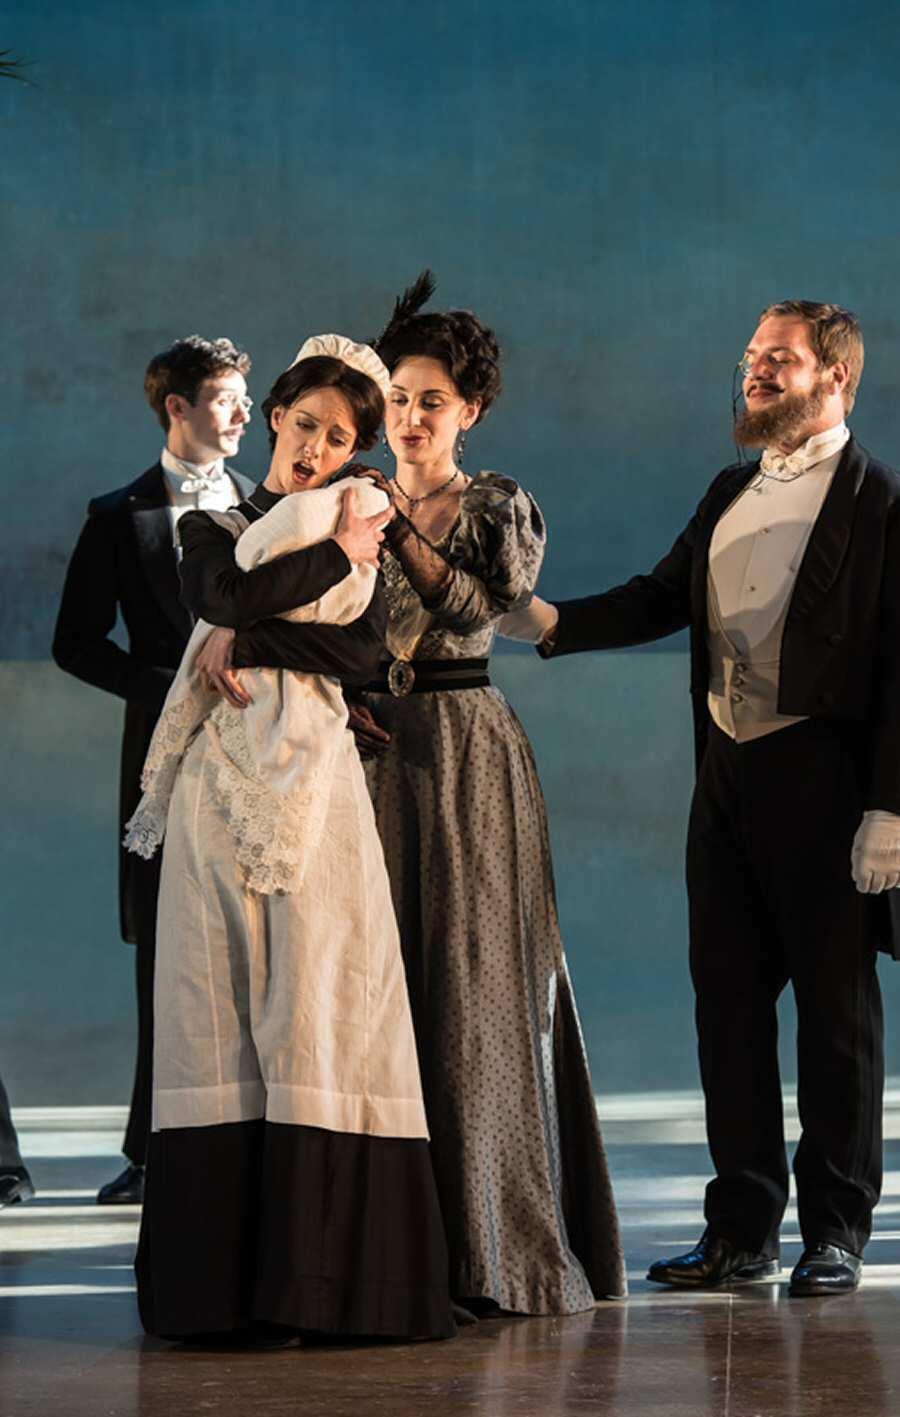 Russian Nanny in Garsington Opera's 2015 production of Death in Venice (photographer Clive Barda)